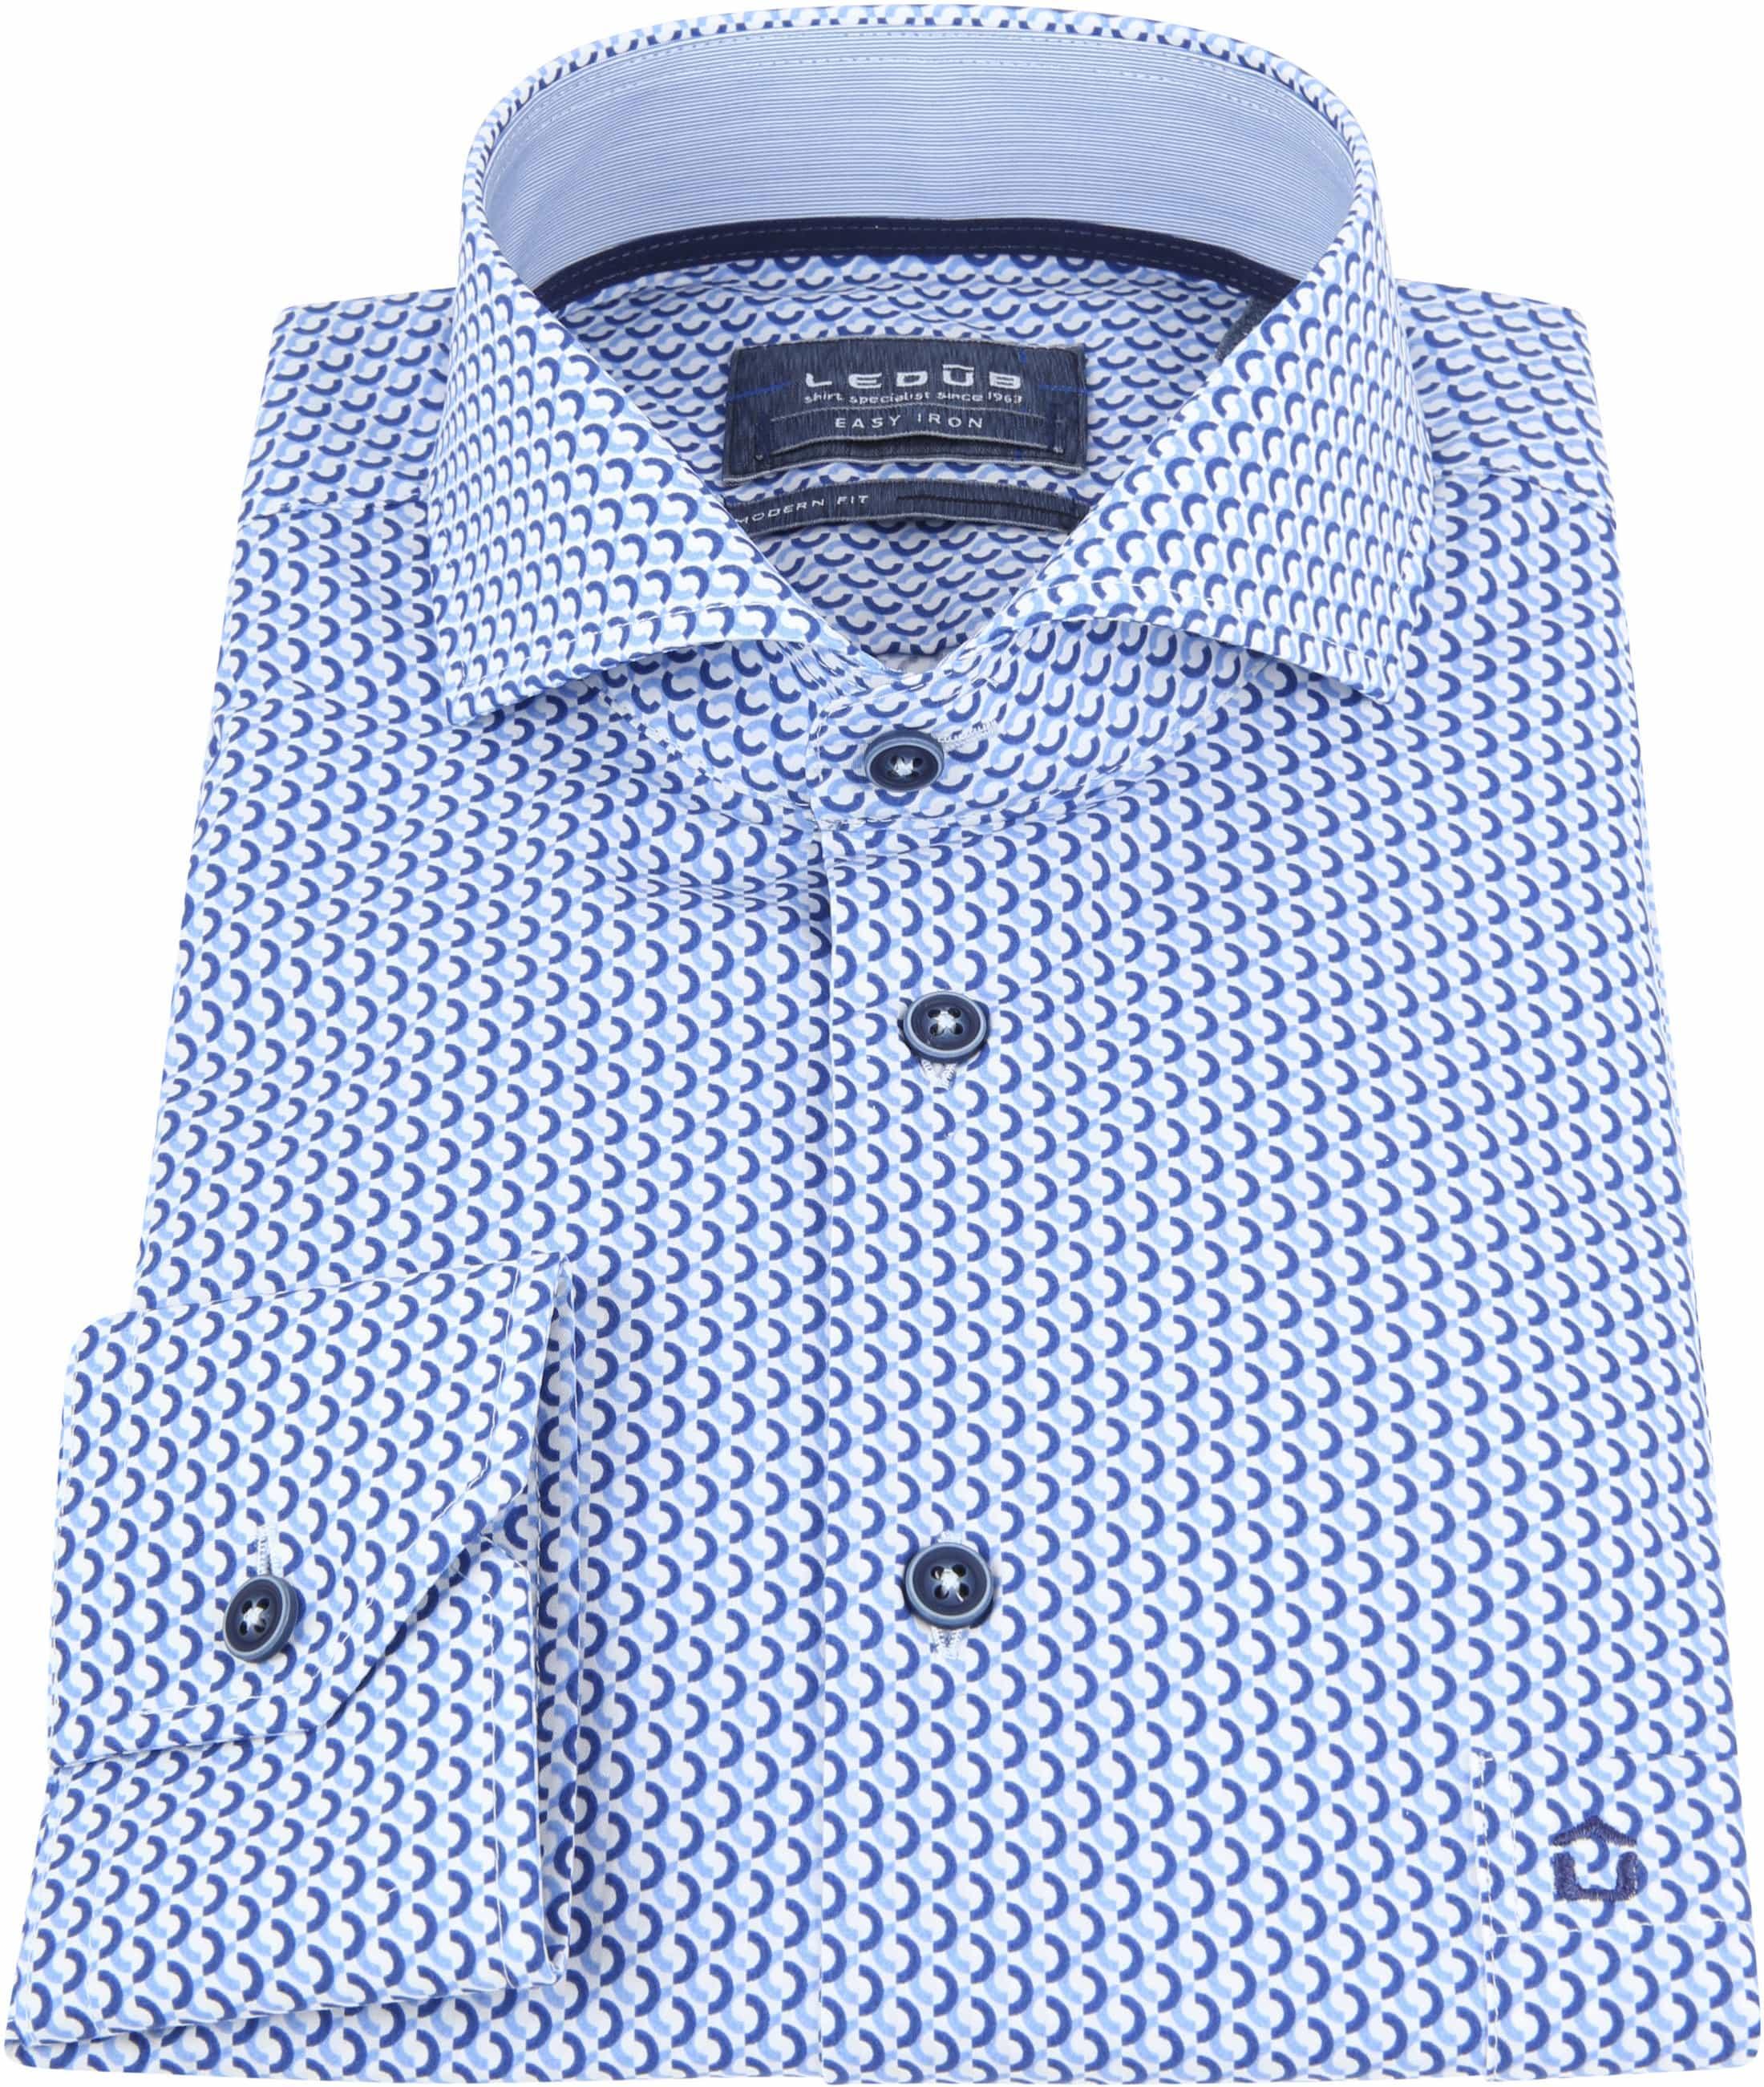 Ledub Overhemd Blauw Patroon foto 2